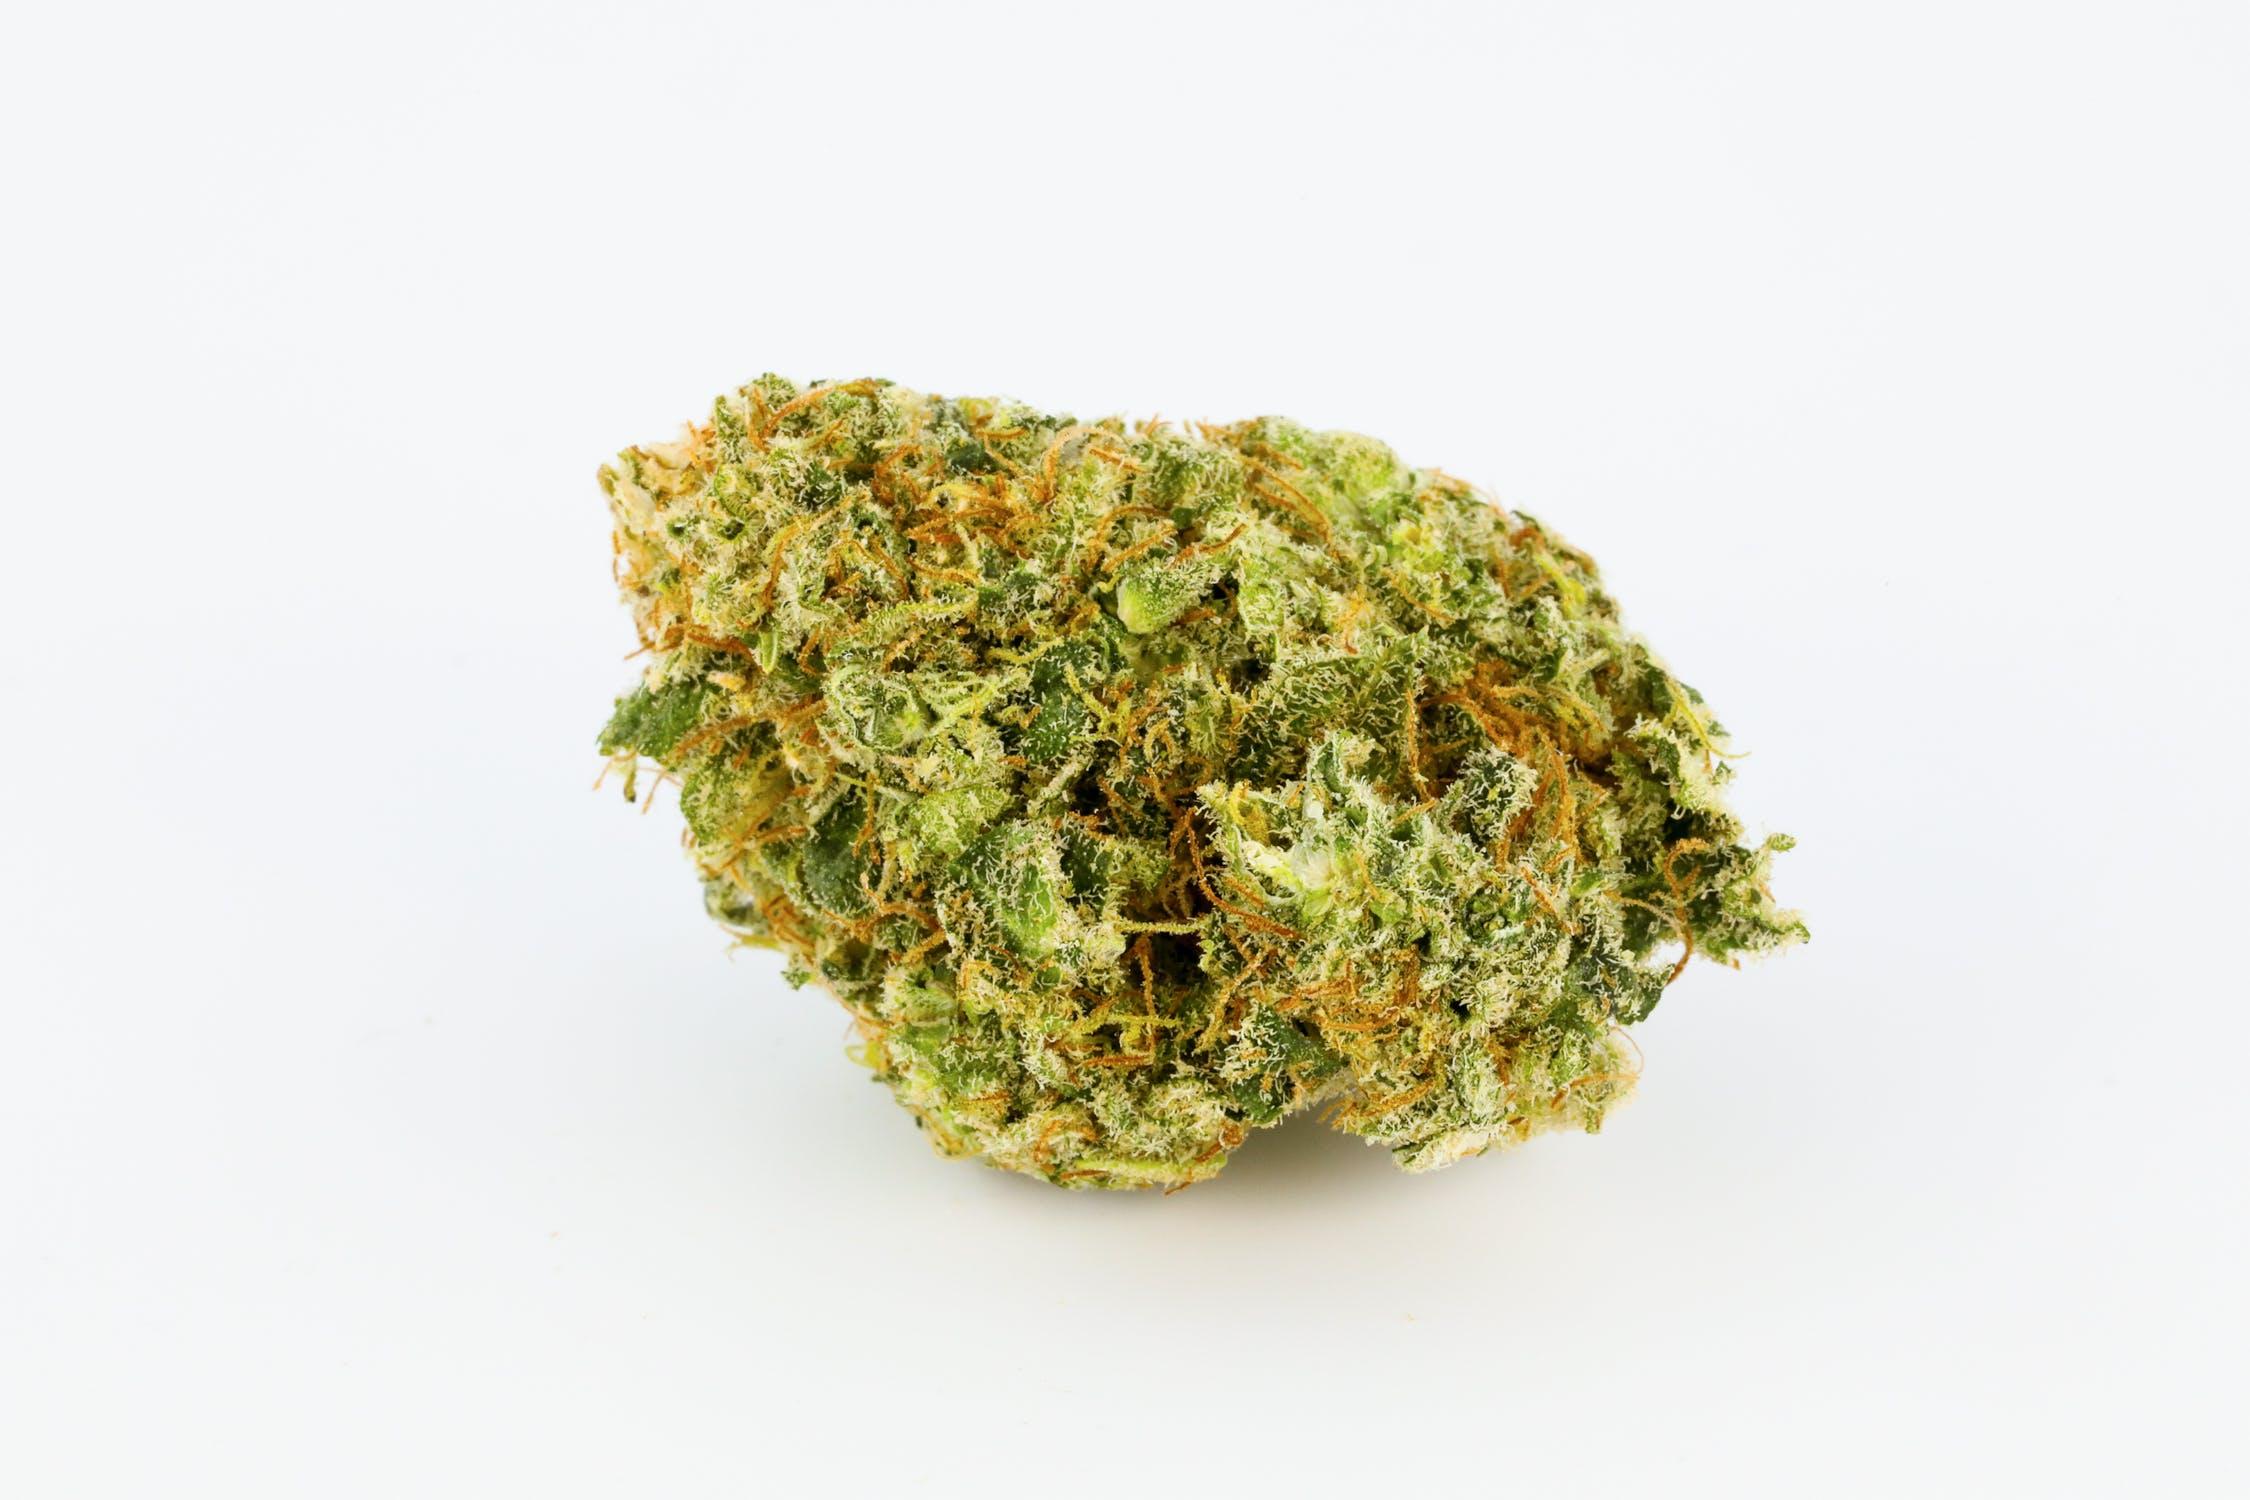 White Cookies Weed; White Cookies Cannabis Strain; White Cookies Hybrid Marijuana Strain